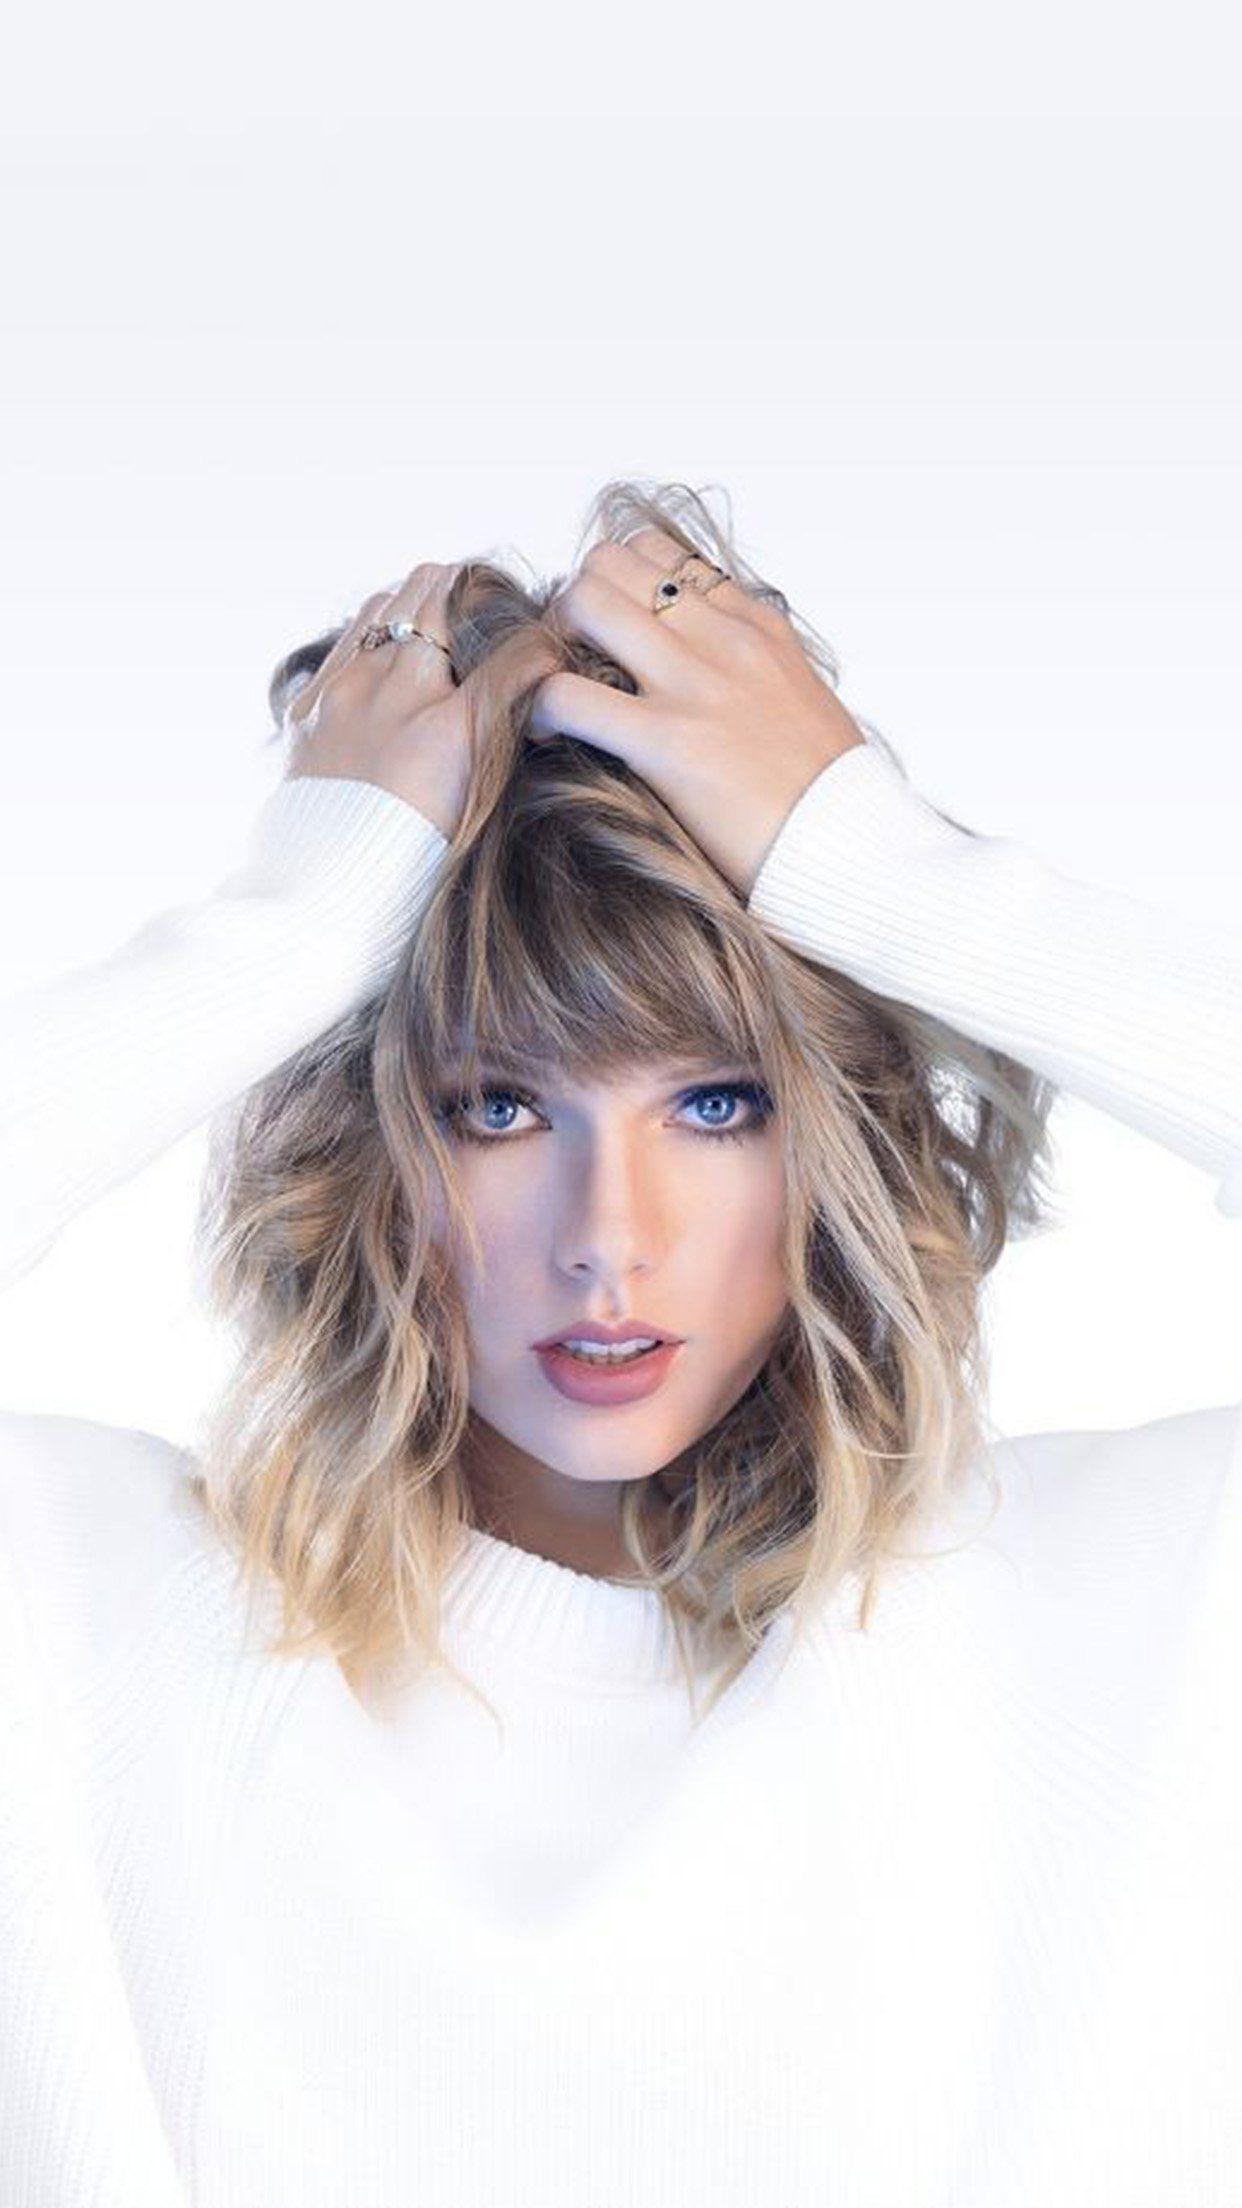 [39+] Taylor Swift 2020 Wallpapers on WallpaperSafari